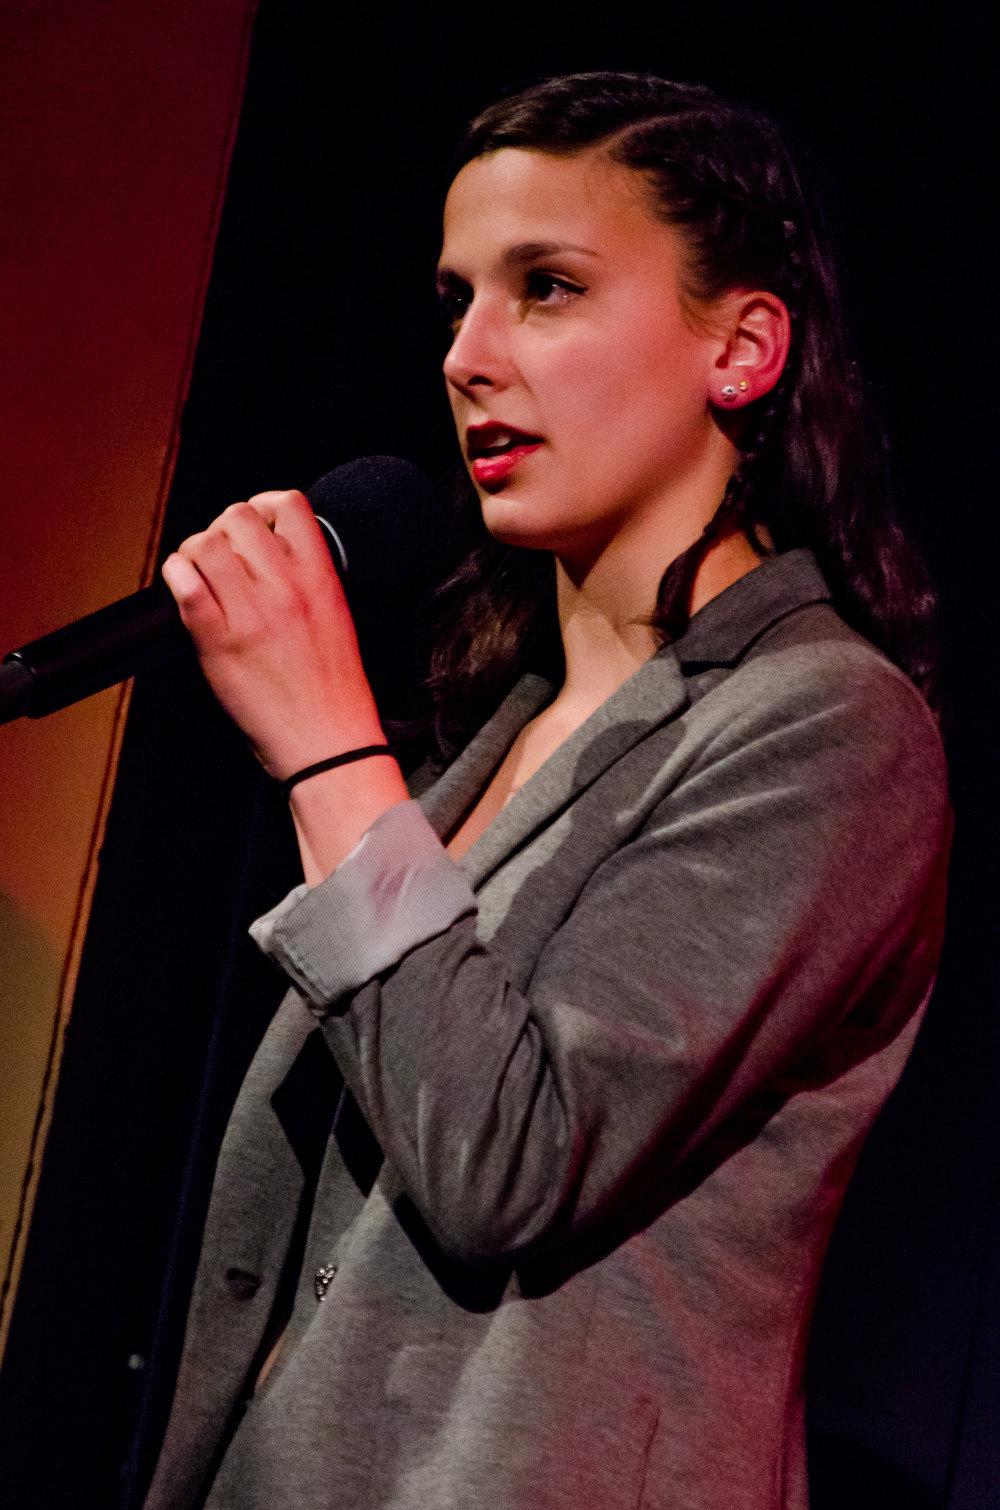 Michaela Coplen '18 won 'Best Spoken Word'   P.C. Angus W. Finlay (  http://www.anguswfinlay.com  )